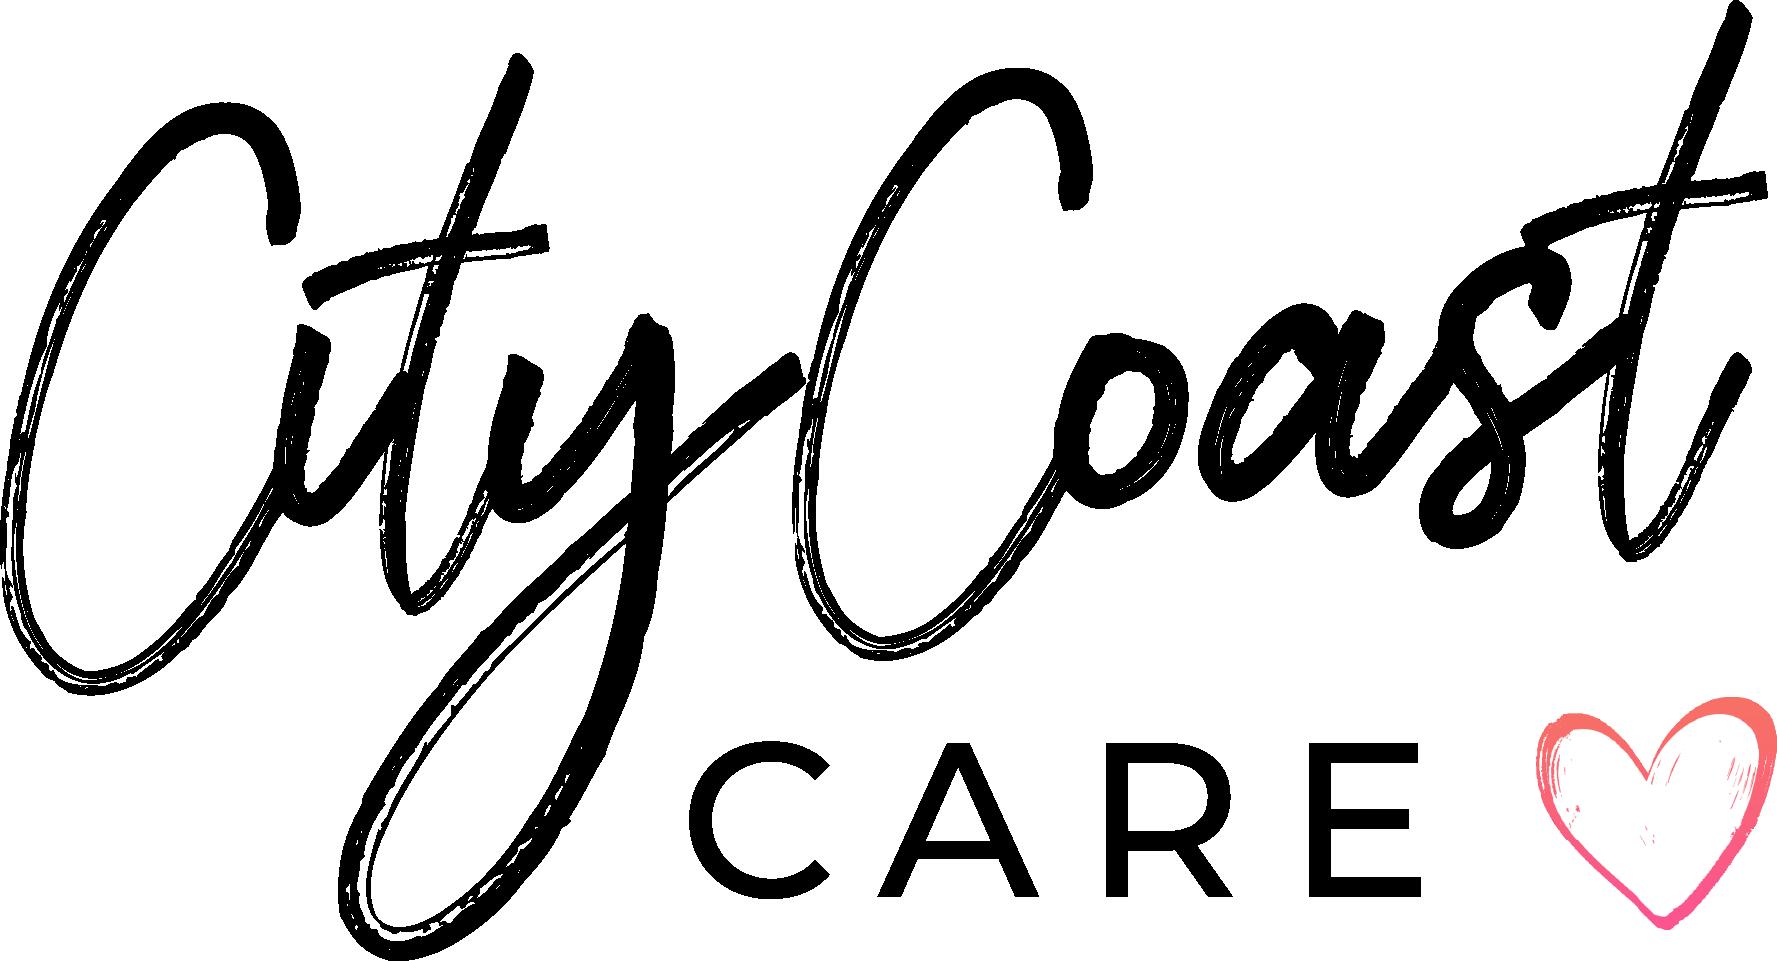 Citycoast Care logo